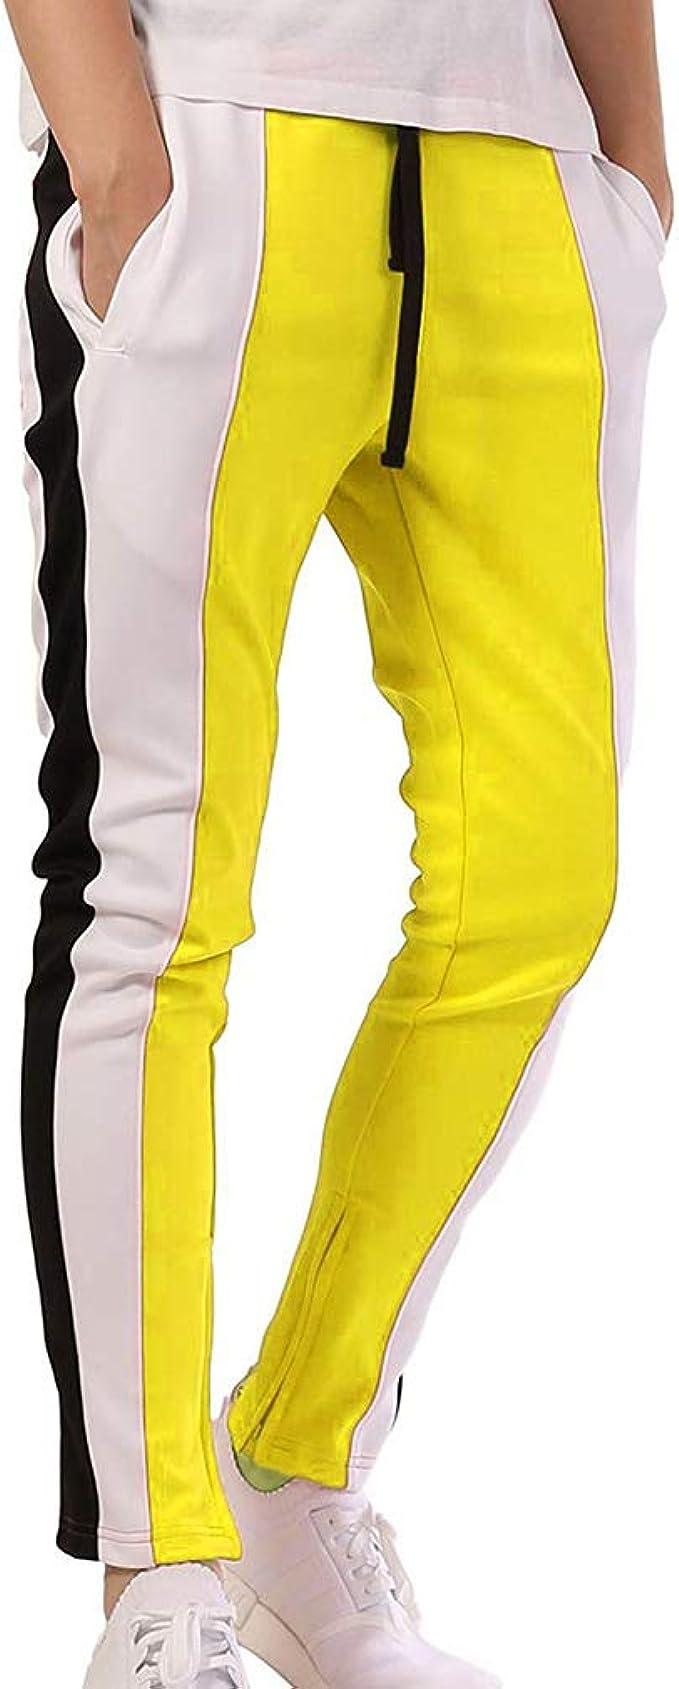 Hombres Deportivos Pantalones Hip Hop Estilo Pants Colorblock ...